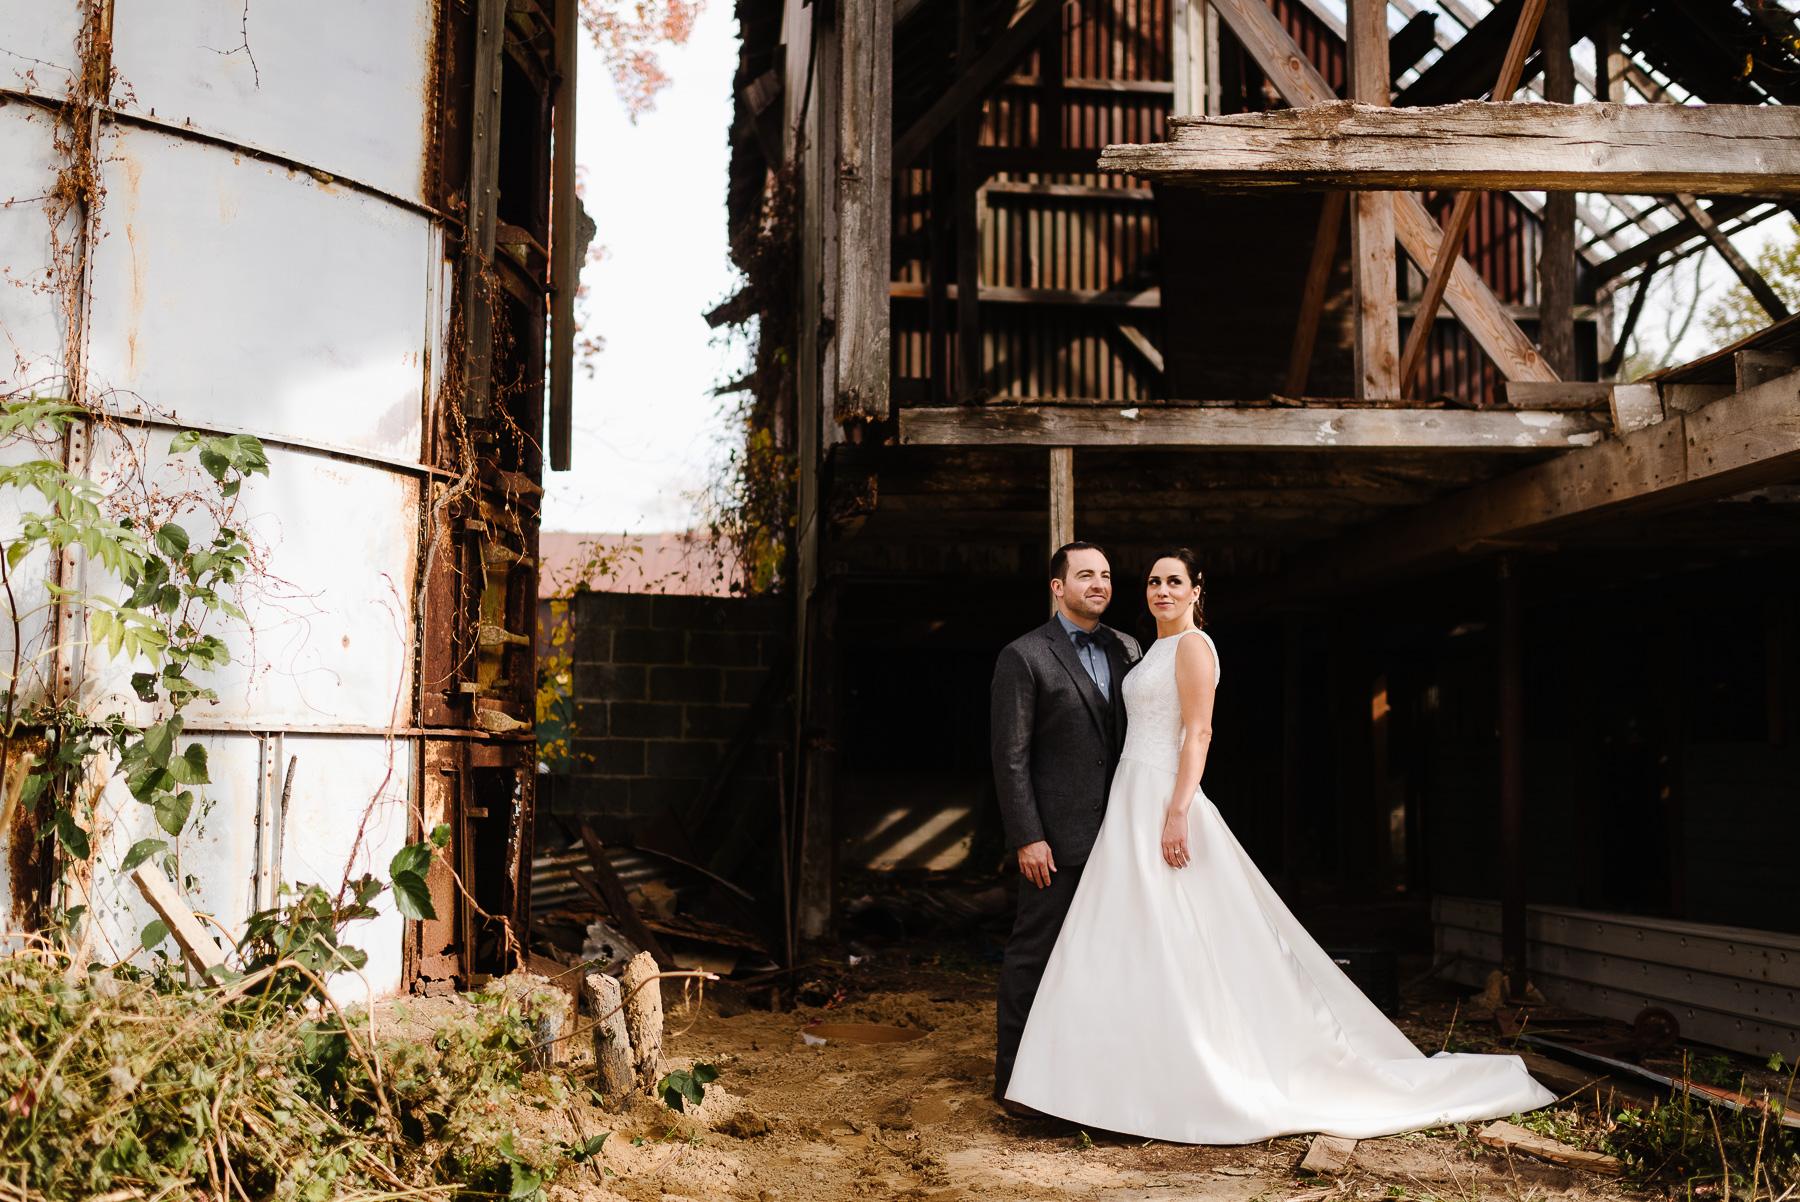 32-Laurita Winery Wedding New Jersey Wedding Photographer Laurita Winery Weddings Longbrook Photography.jpg